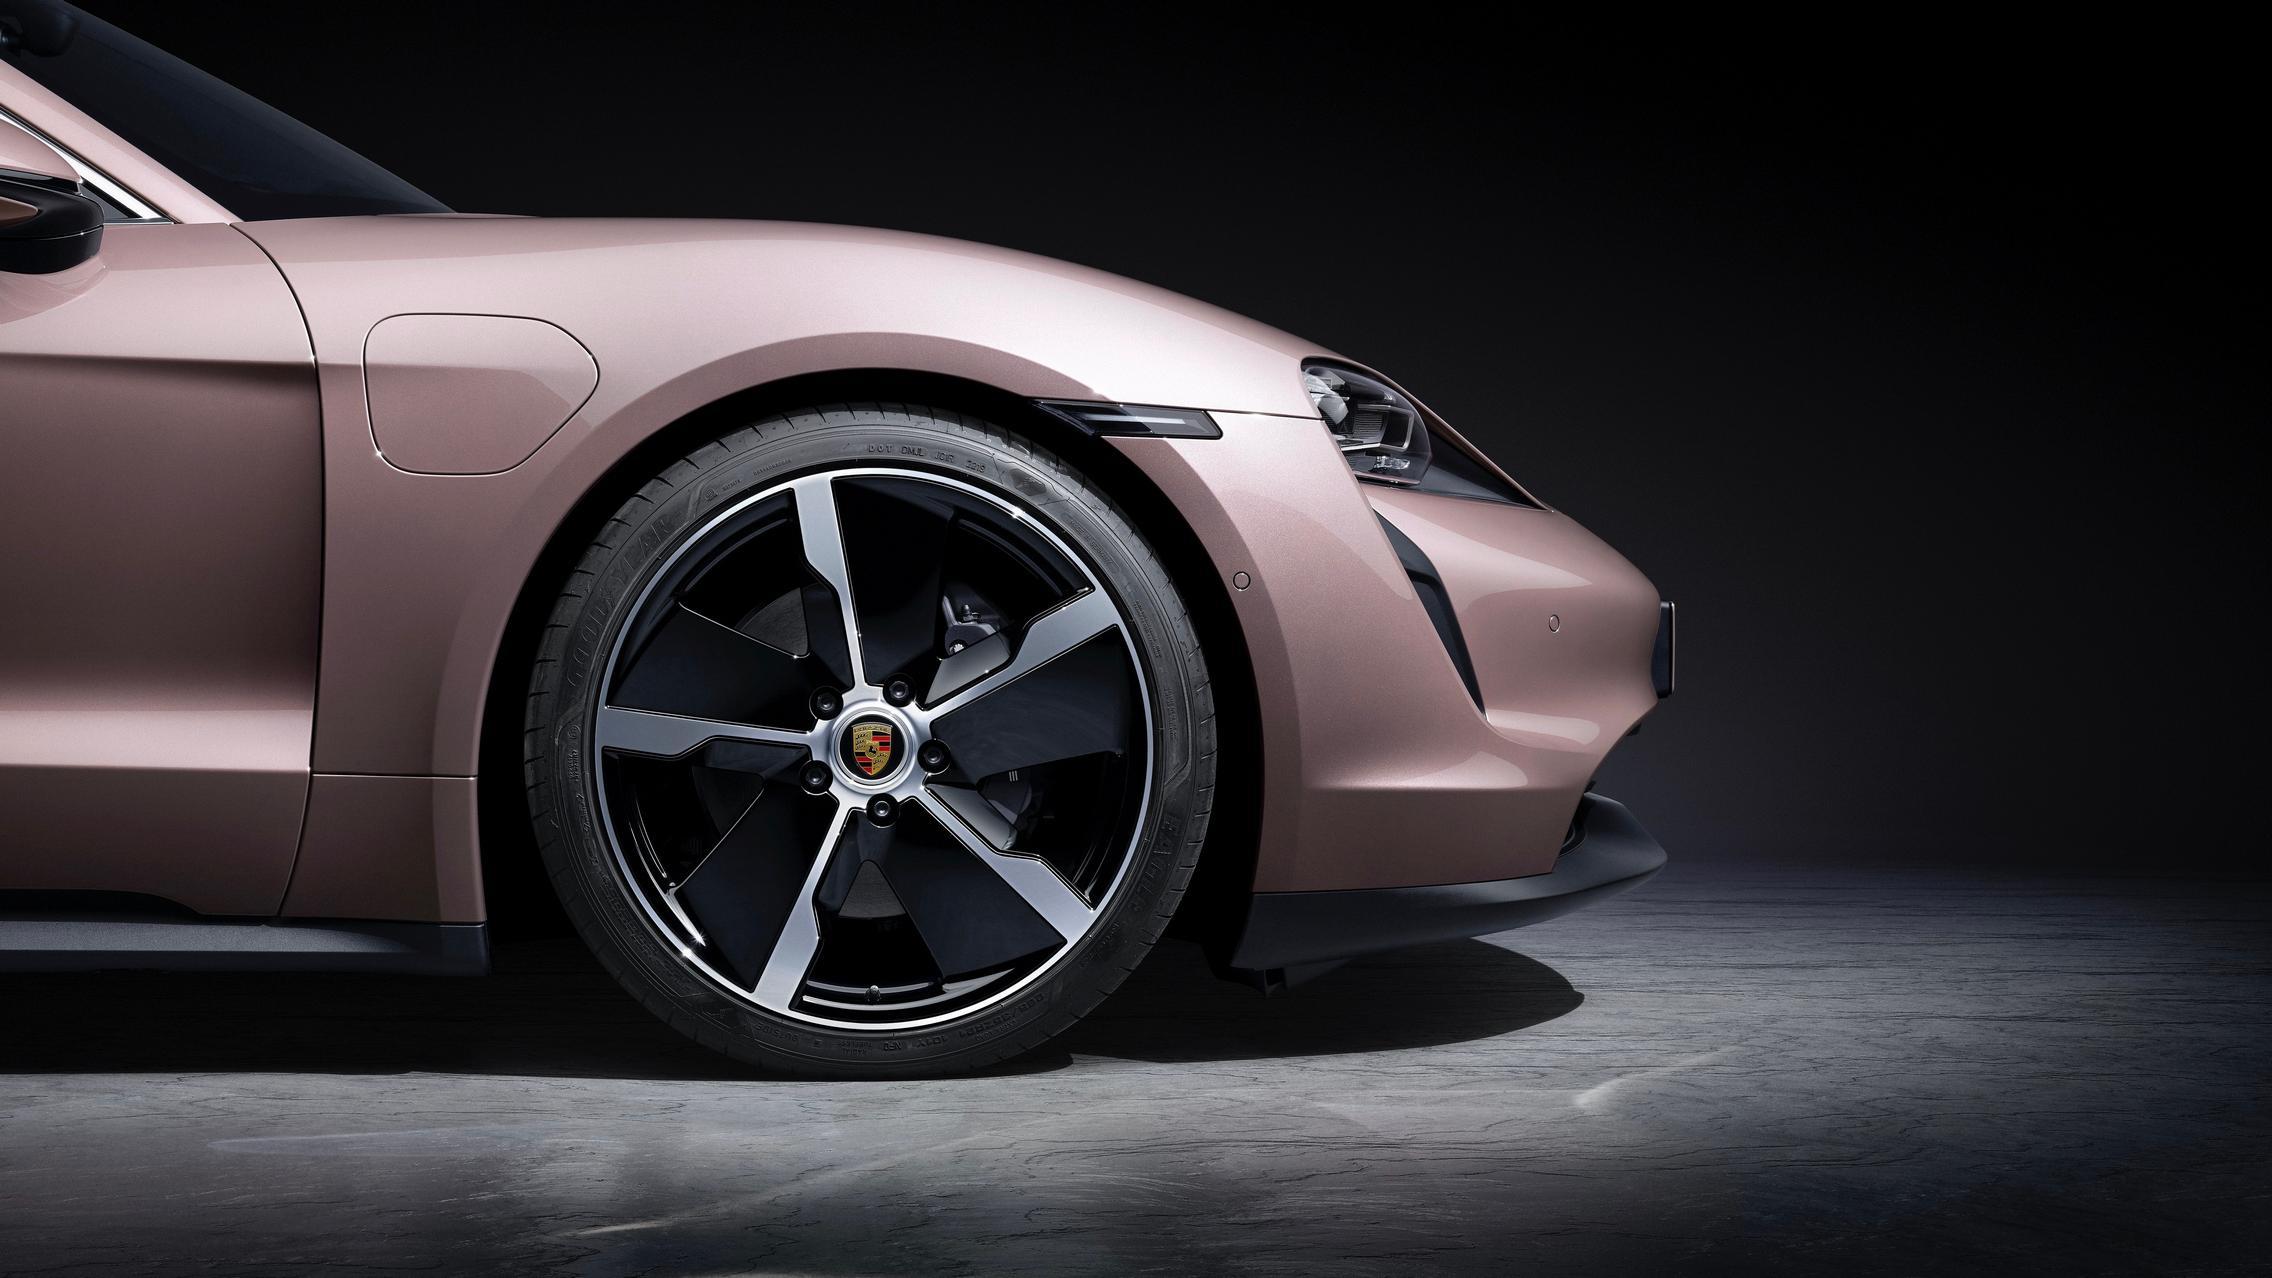 Porsche Taycan RWD wheels